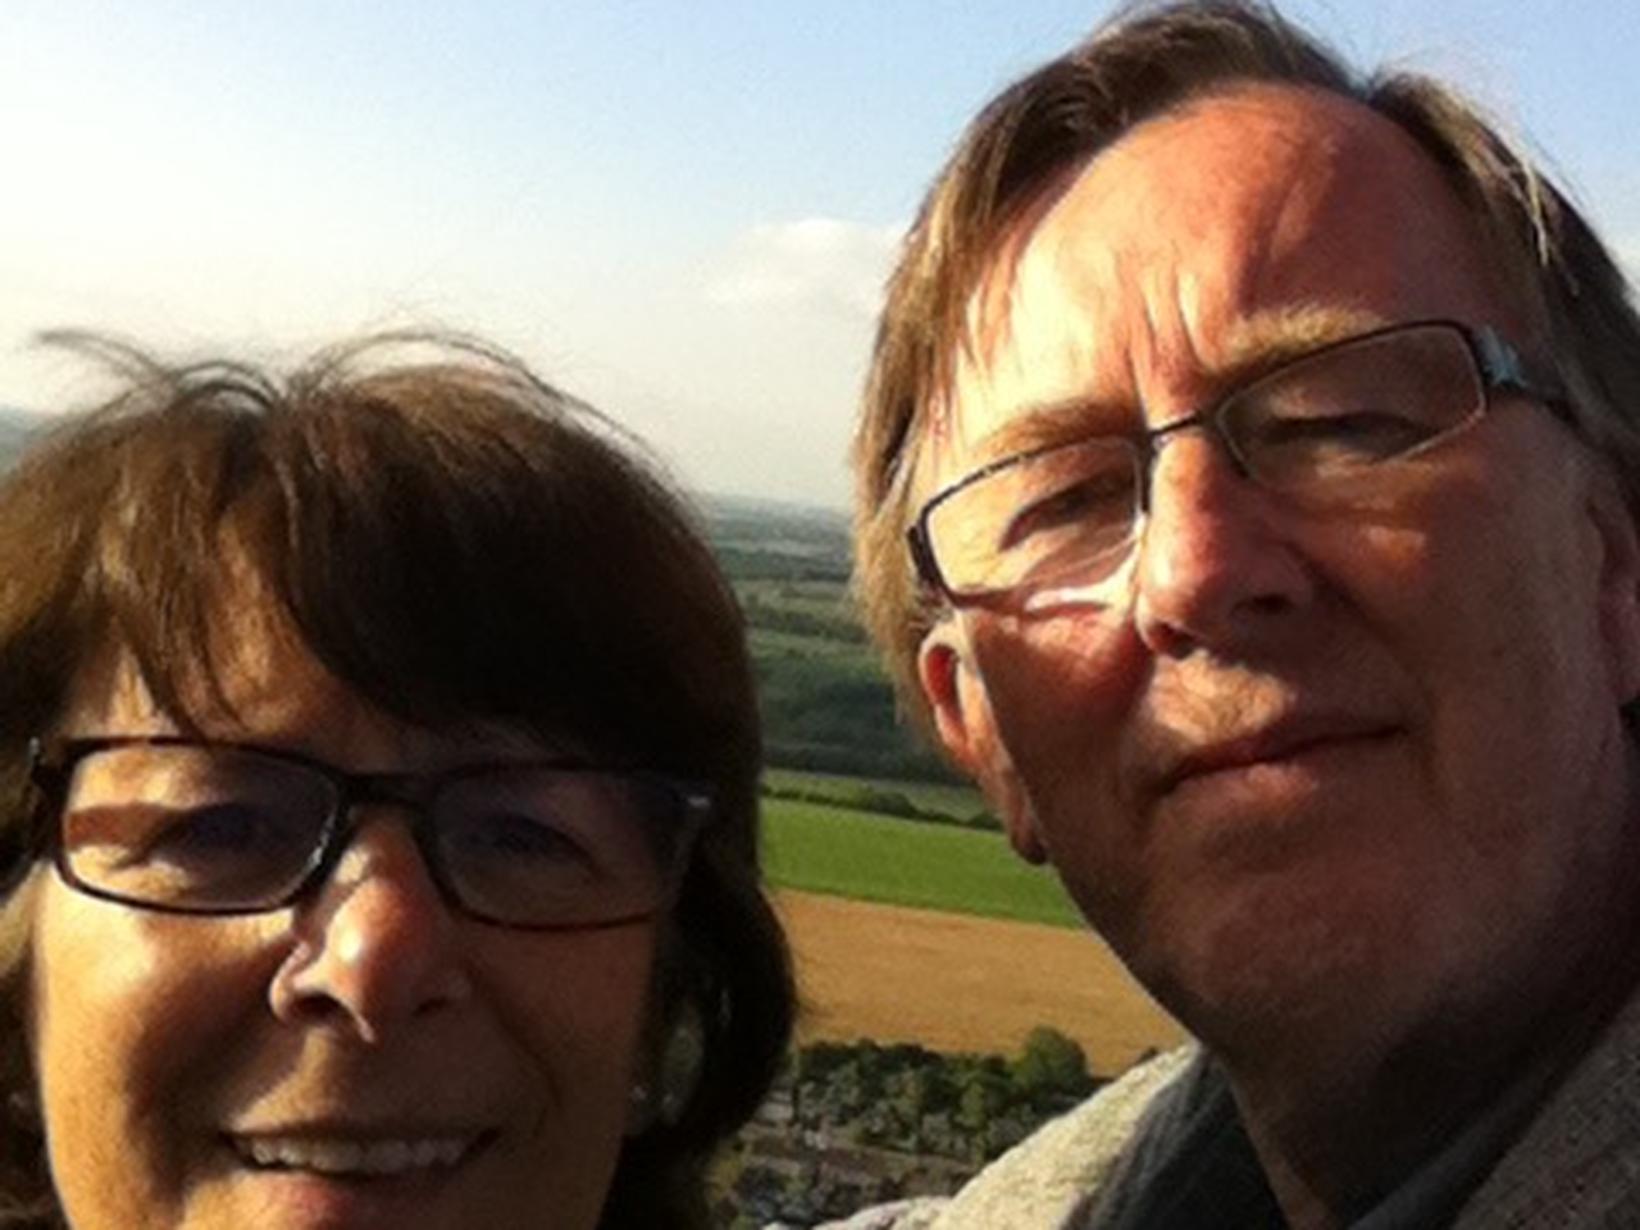 Susan & David from Victoria, British Columbia, Canada